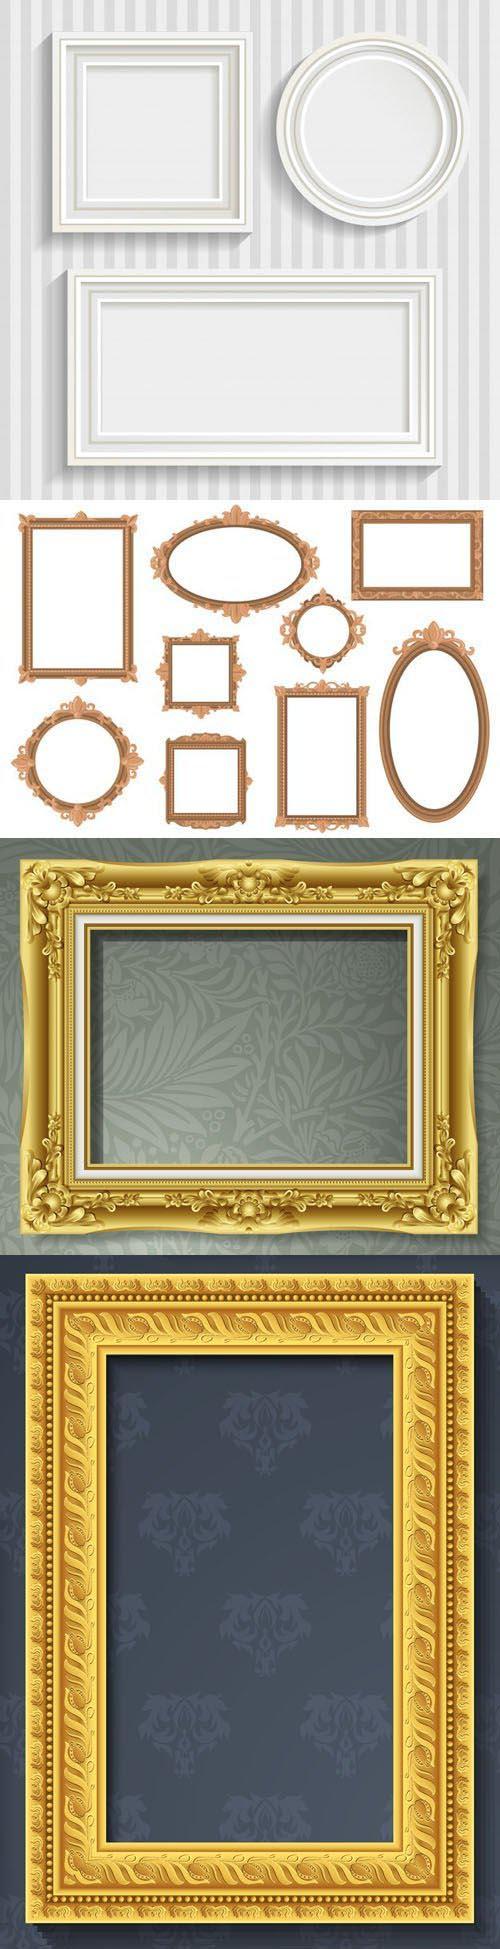 10 Realistic Photo Frames Vector Templates